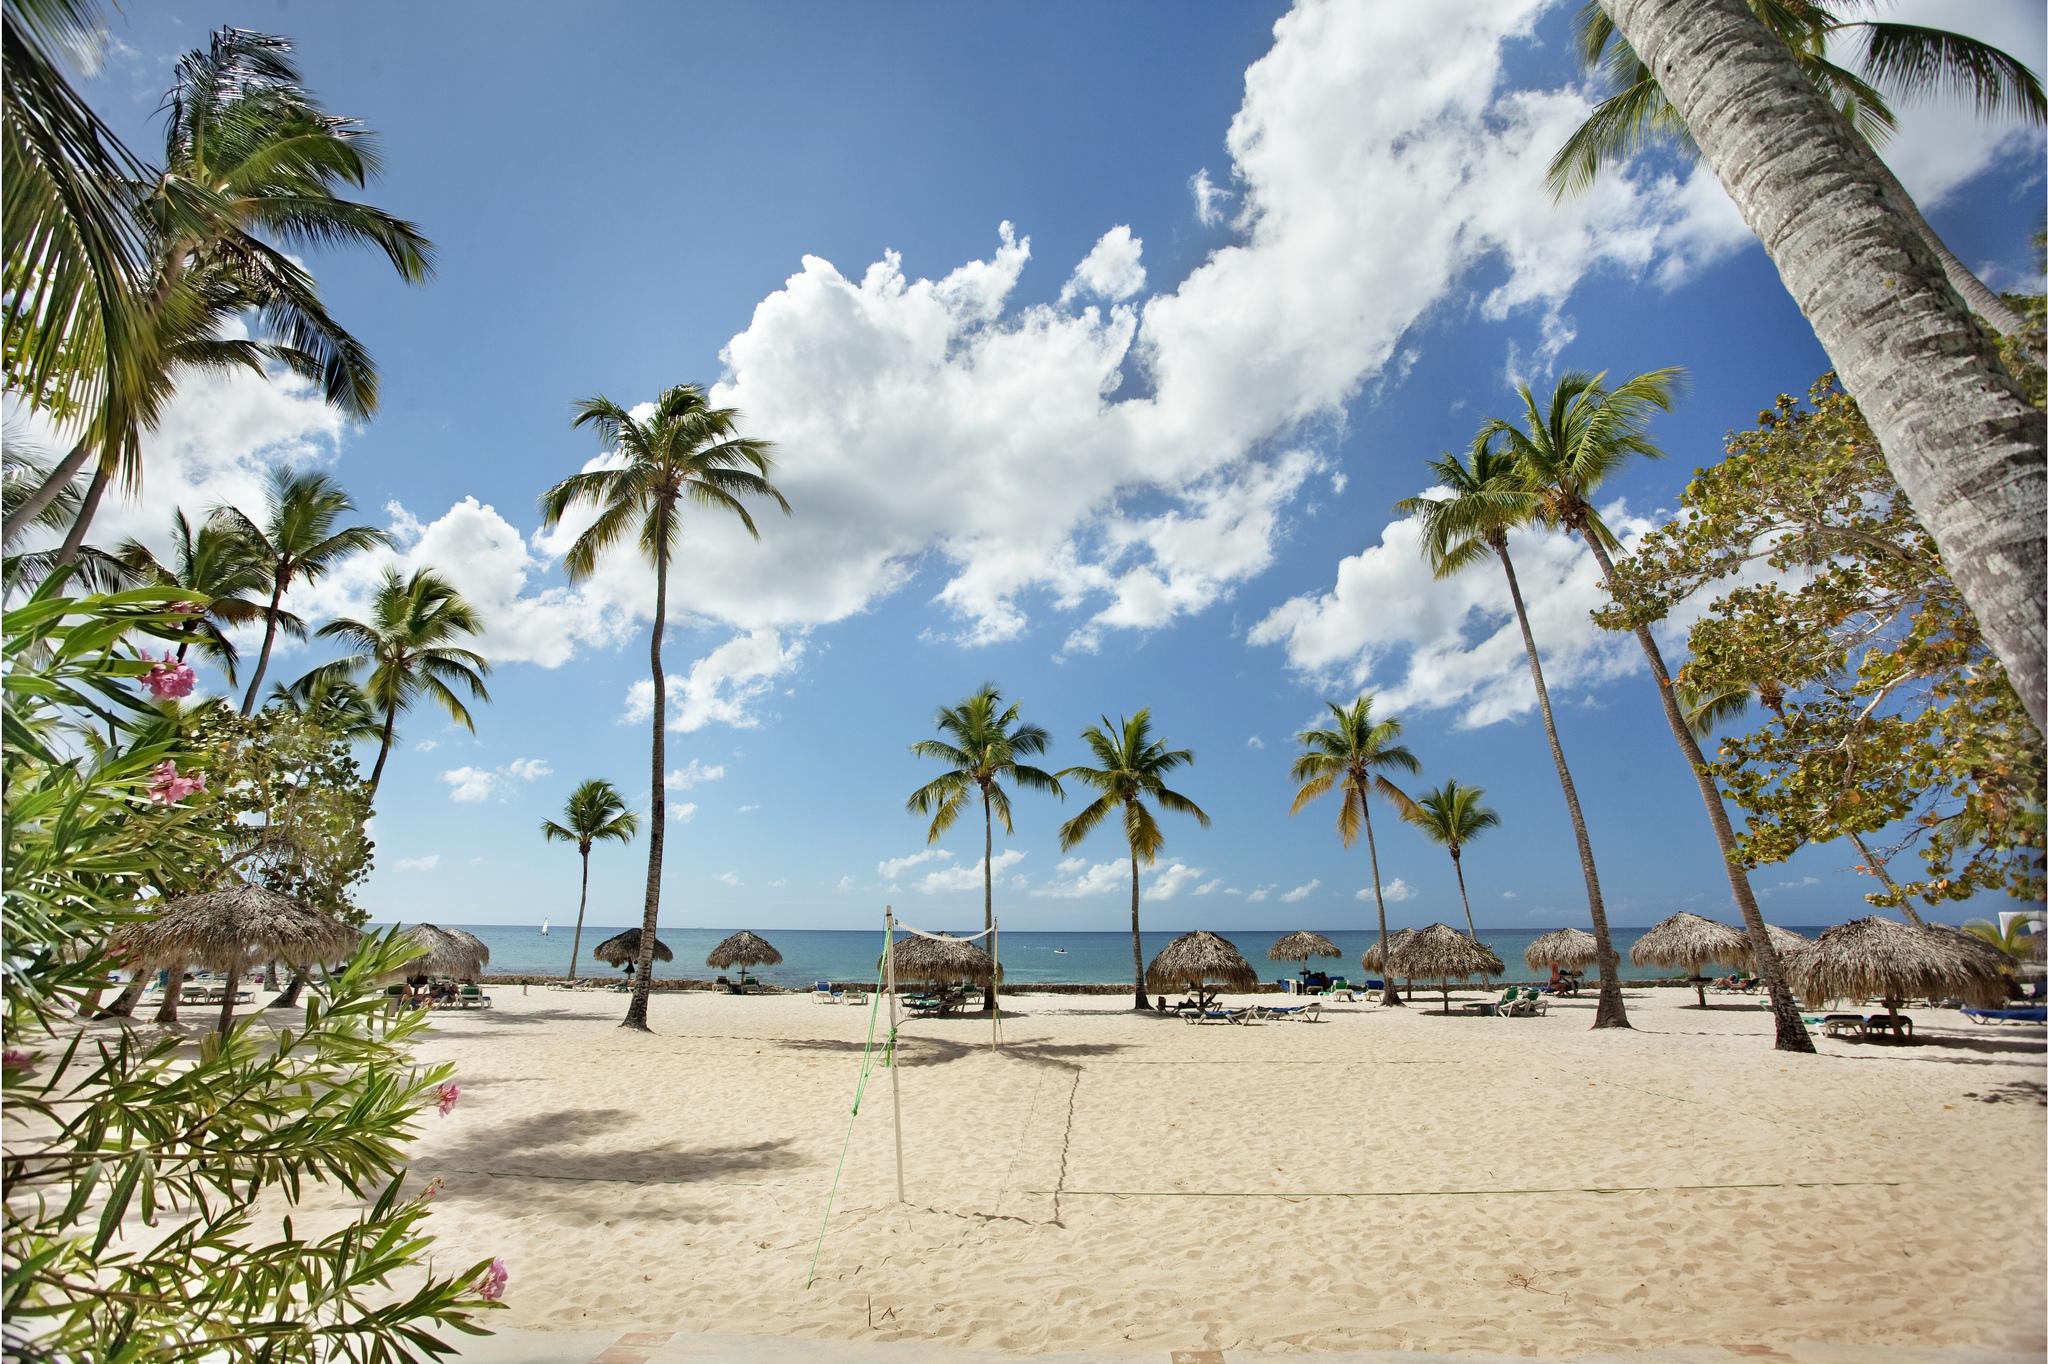 Terrain de Beach volley